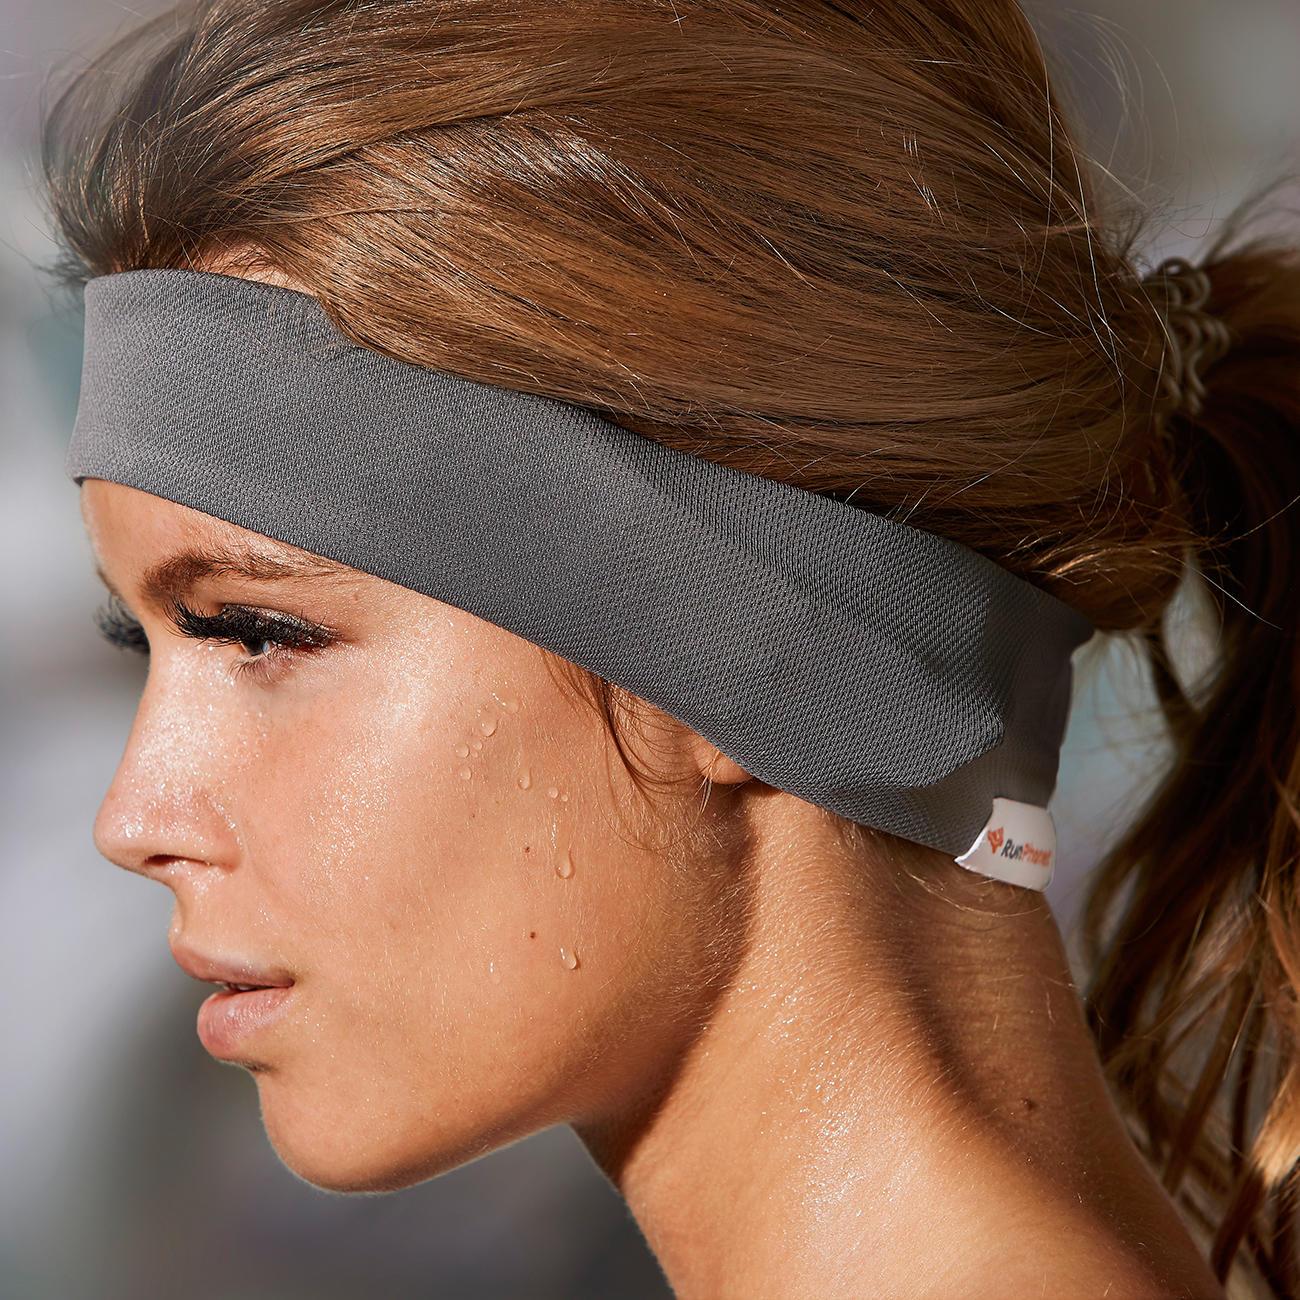 runphones stirnband mit bluetooth integriertem kopfh rer f r smartphone und mp3 player gr s grau. Black Bedroom Furniture Sets. Home Design Ideas